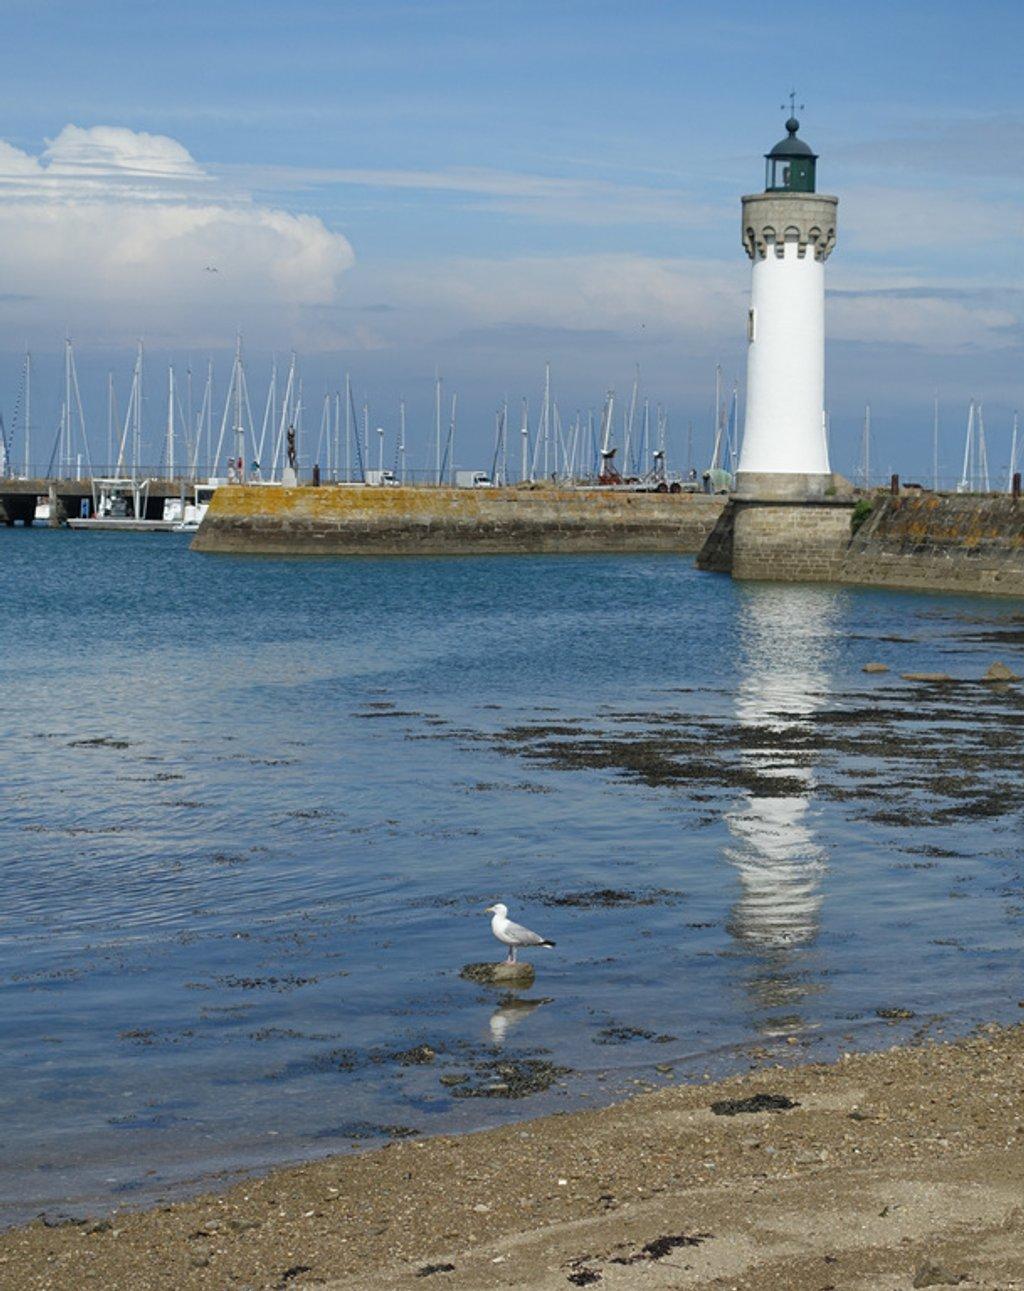 170627 - Port Haliguen by bob65